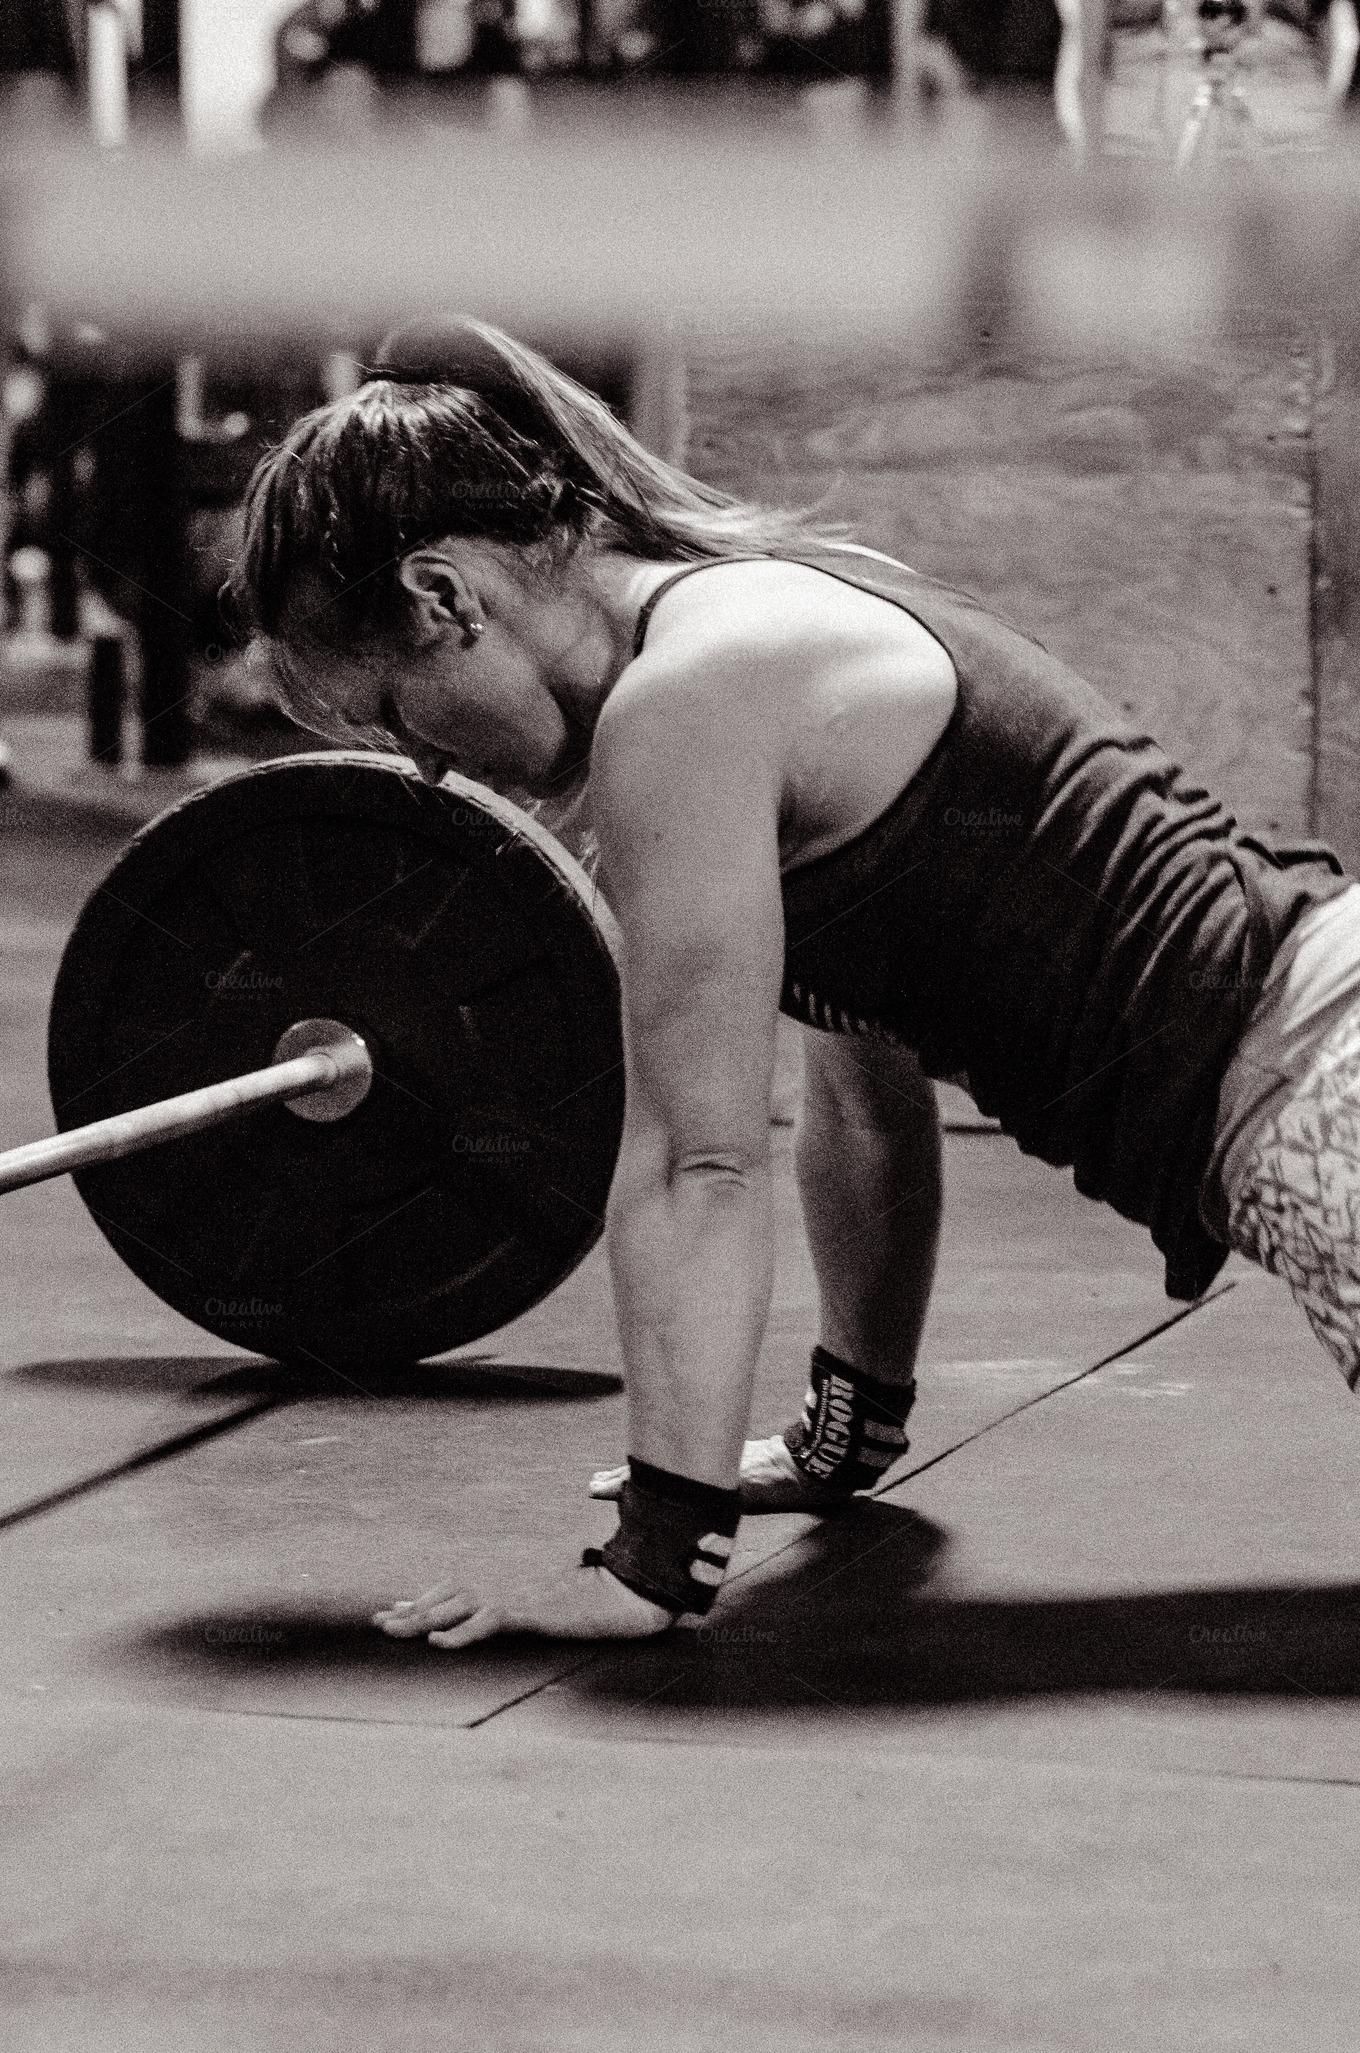 Crossfit Workout Black...